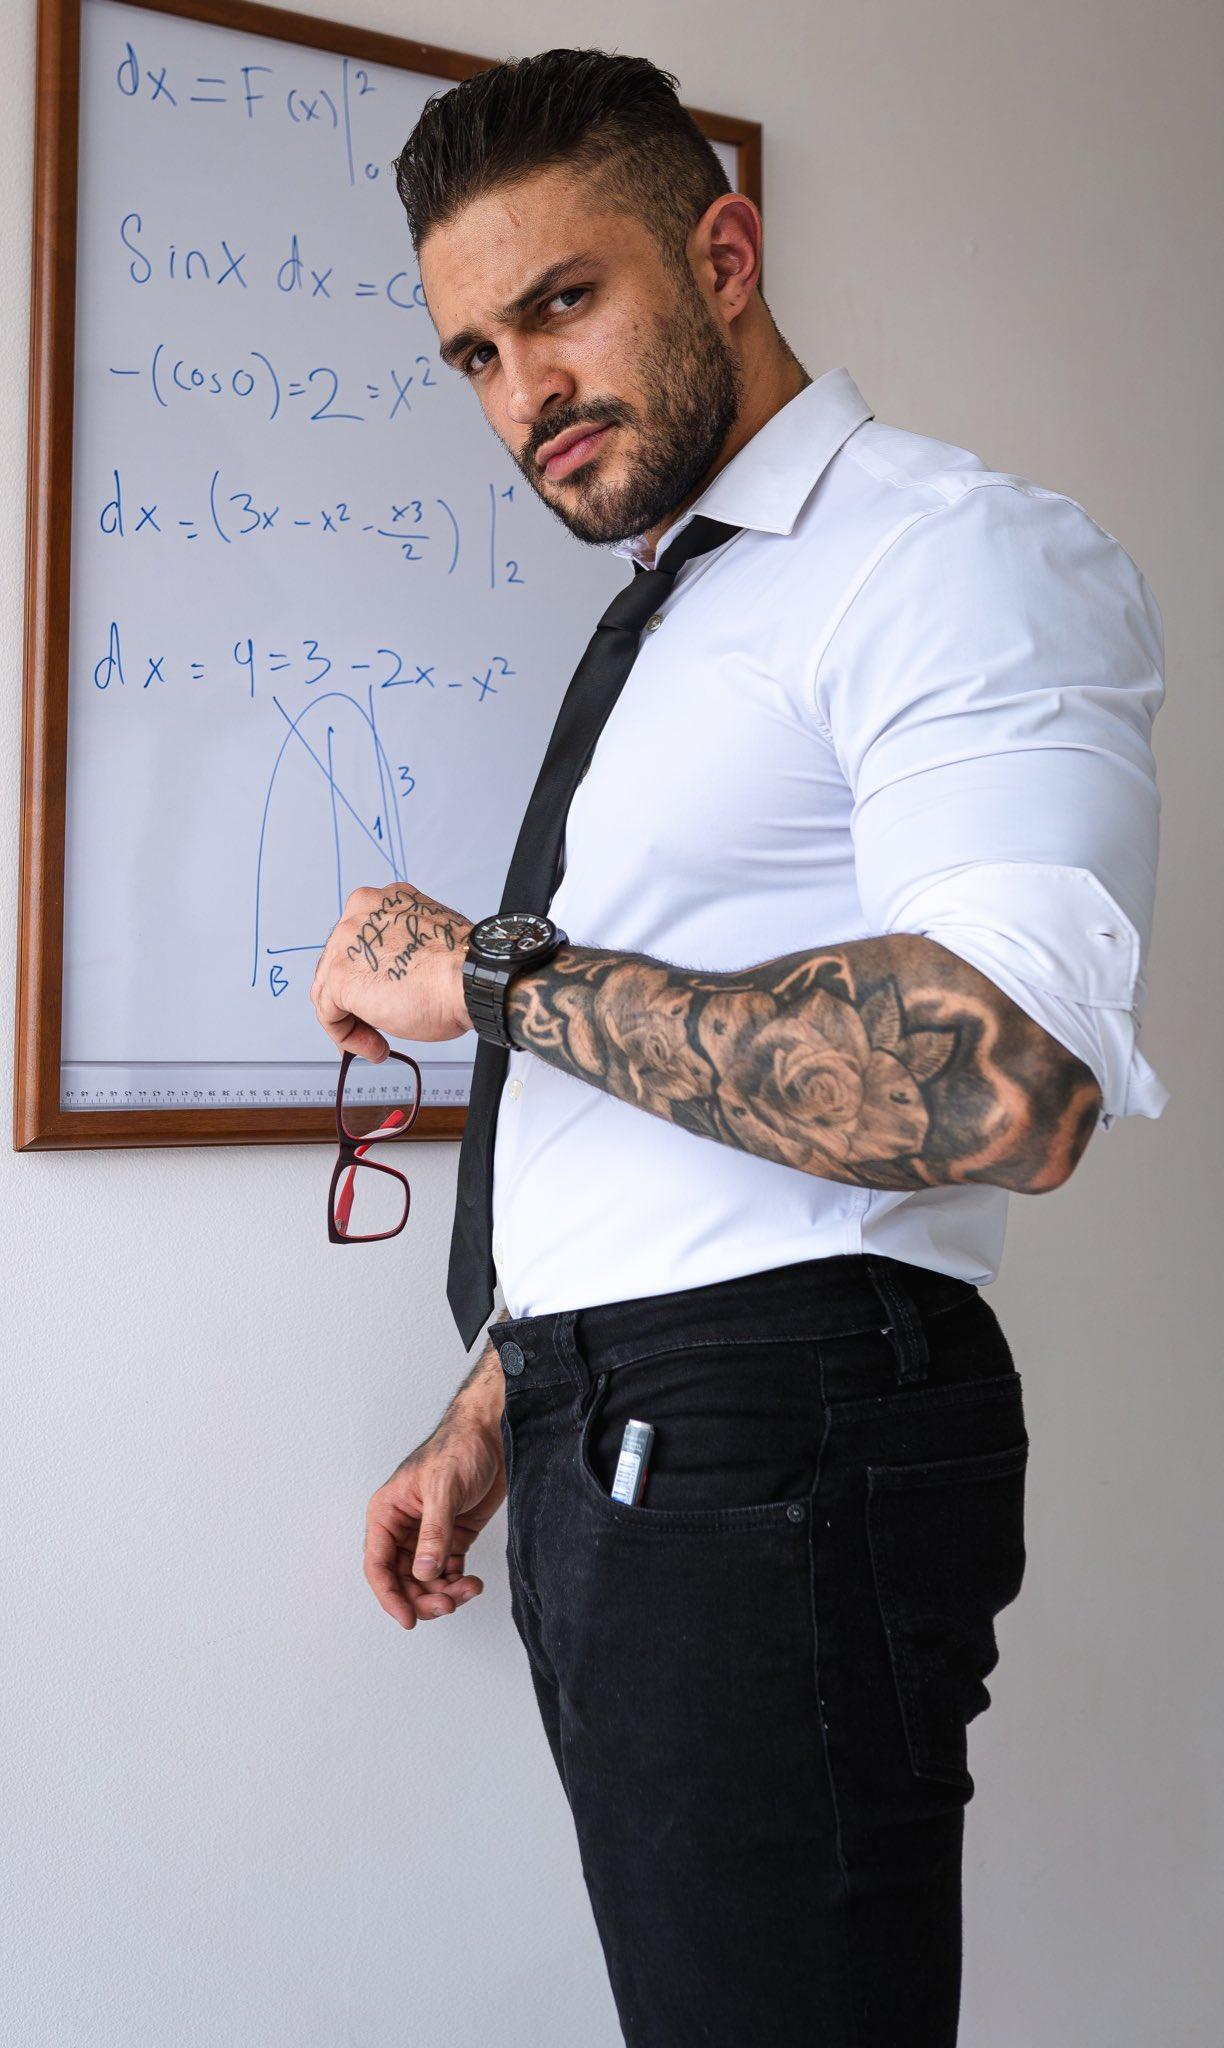 profesor guapo